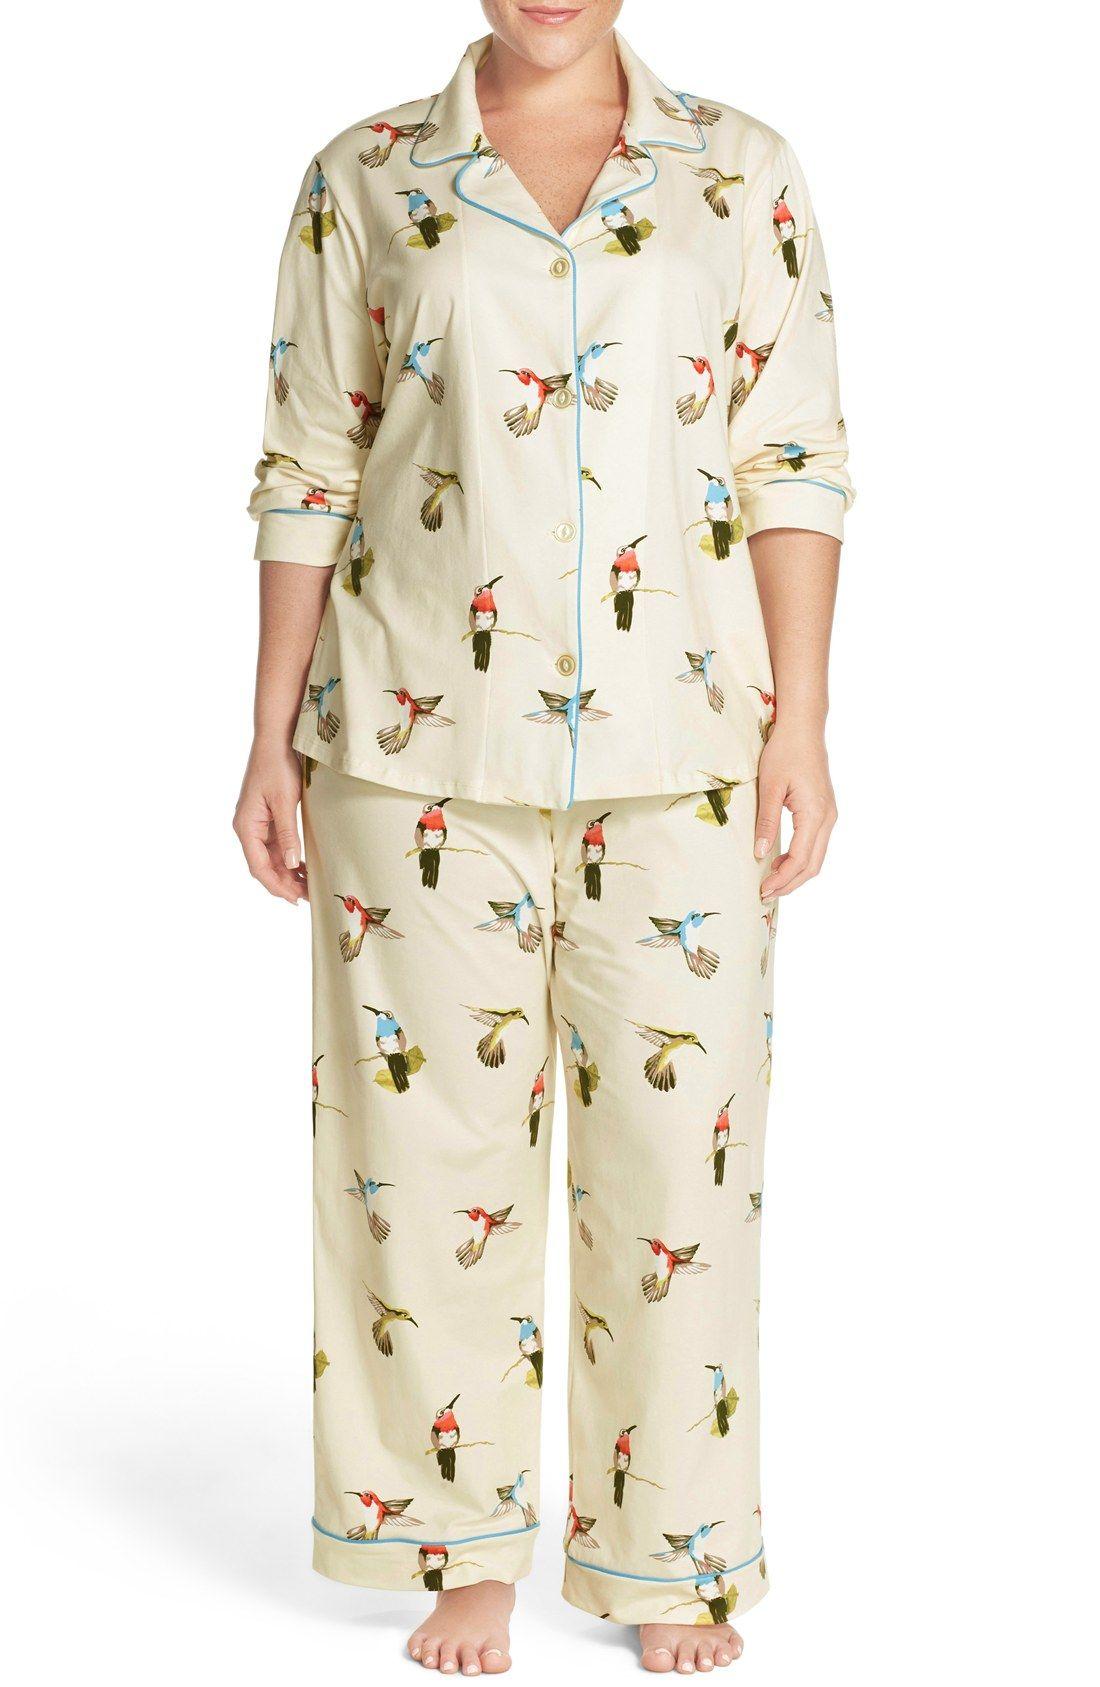 Bedhead Humming Birds Stretch Cotton Pajamas Plus Size Nordstrom Cotton Pyjamas Plus Size Pajamas Stretch Cotton